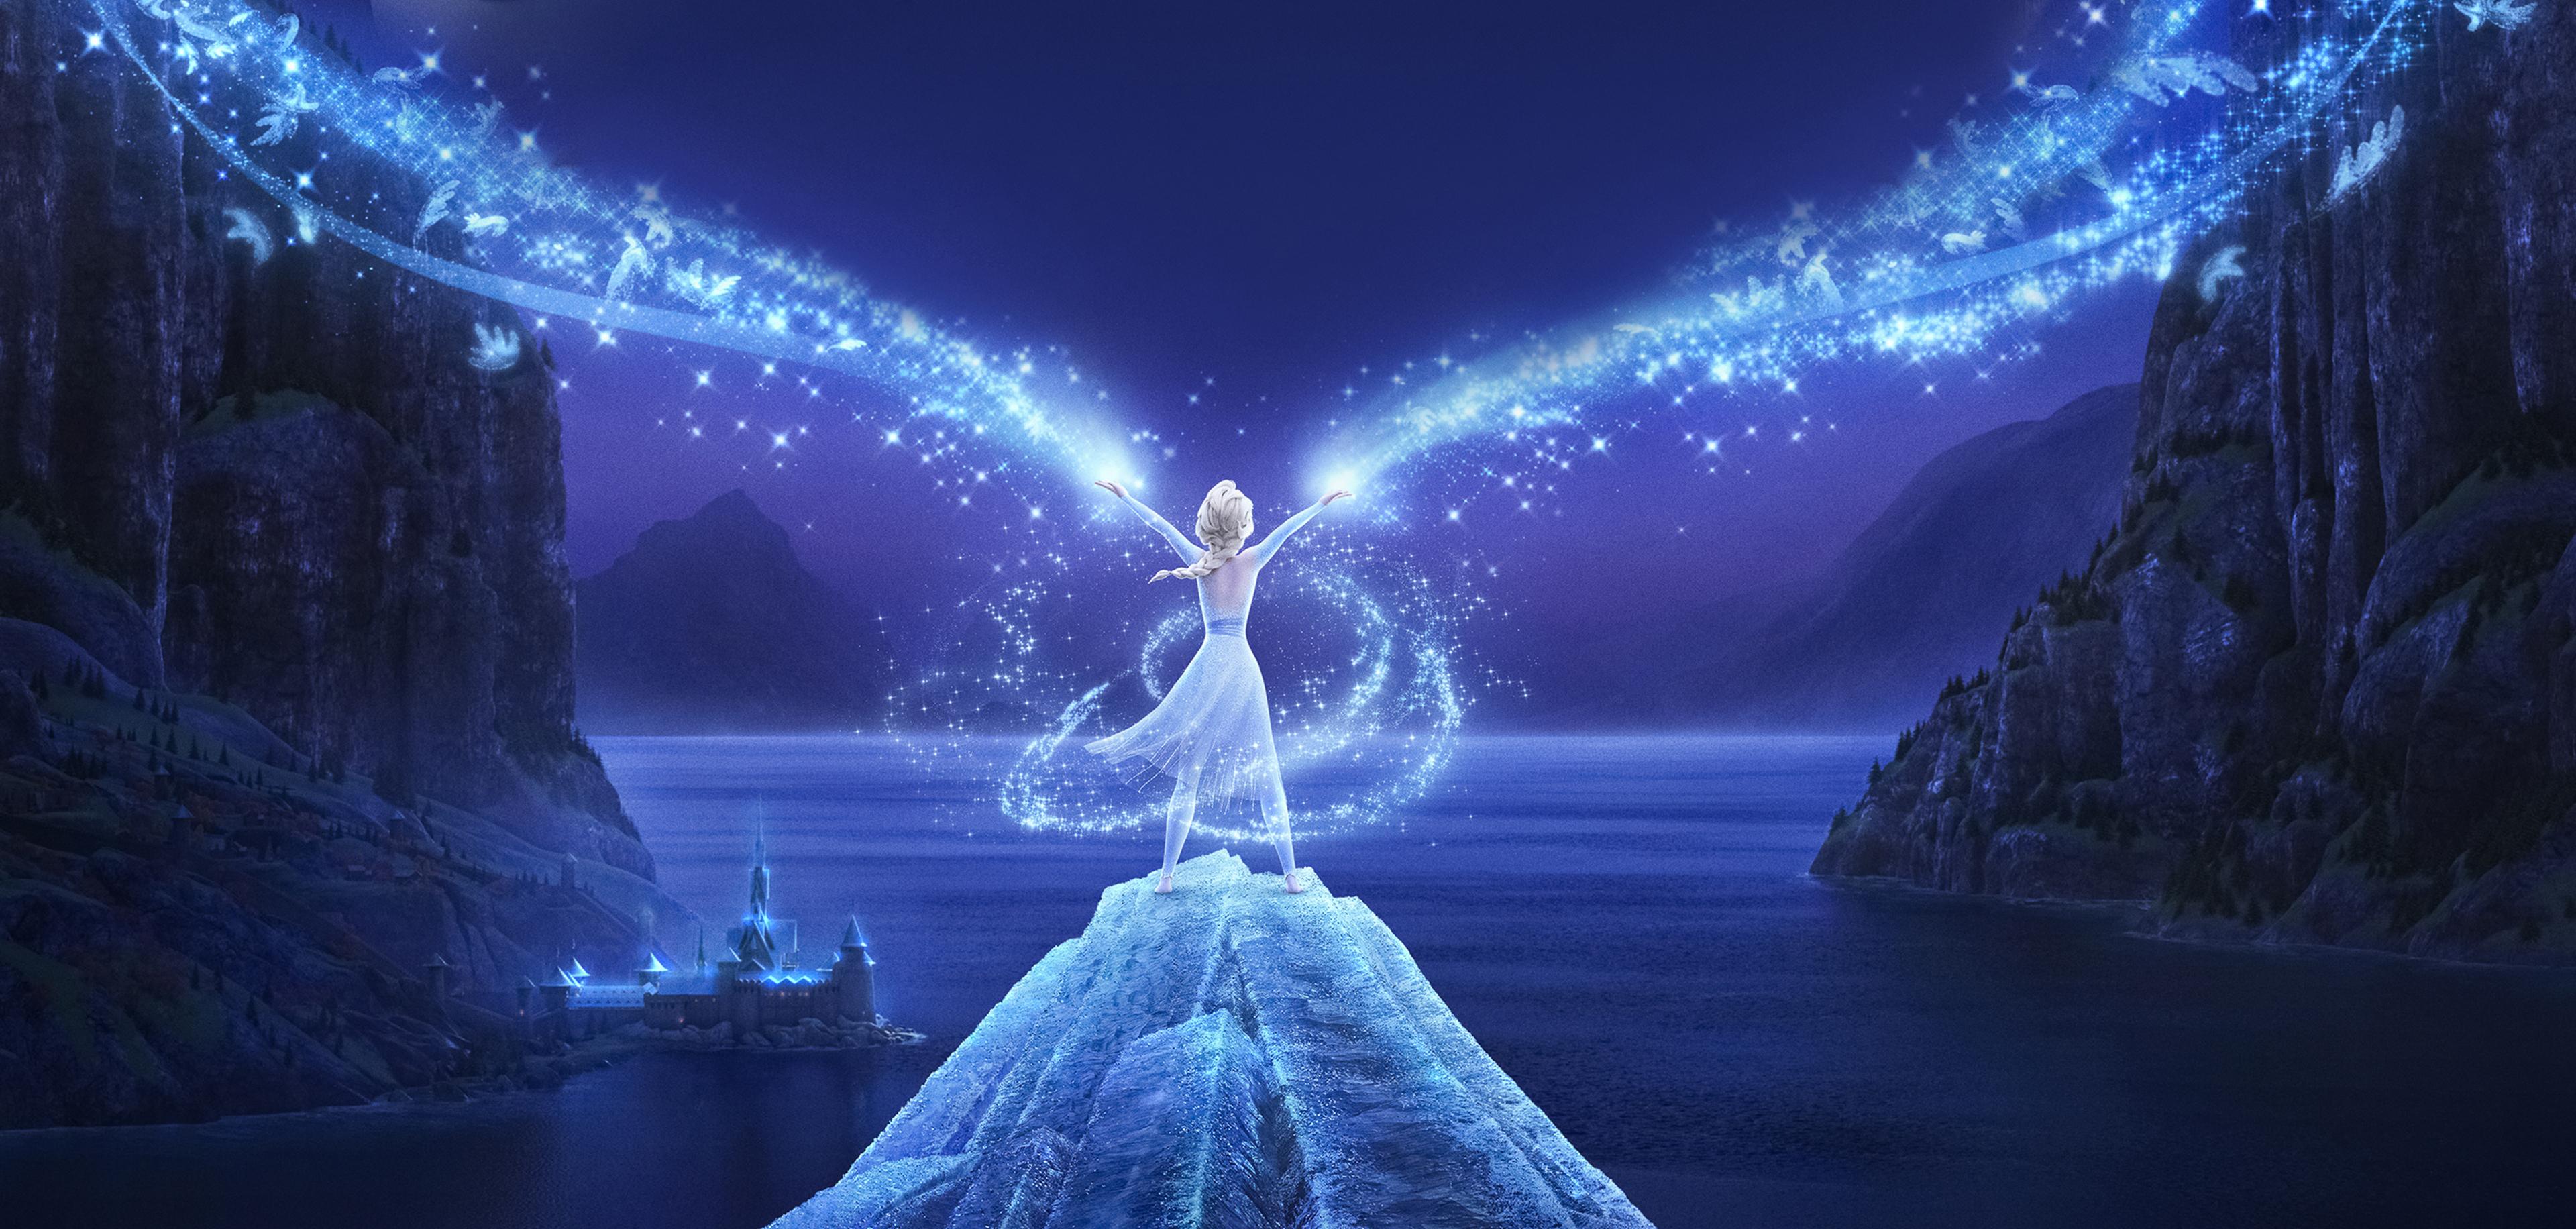 frozen queen elsa 4k 1602434717 - Frozen Queen Elsa 4k - Frozen Queen Elsa 4k wallpapers